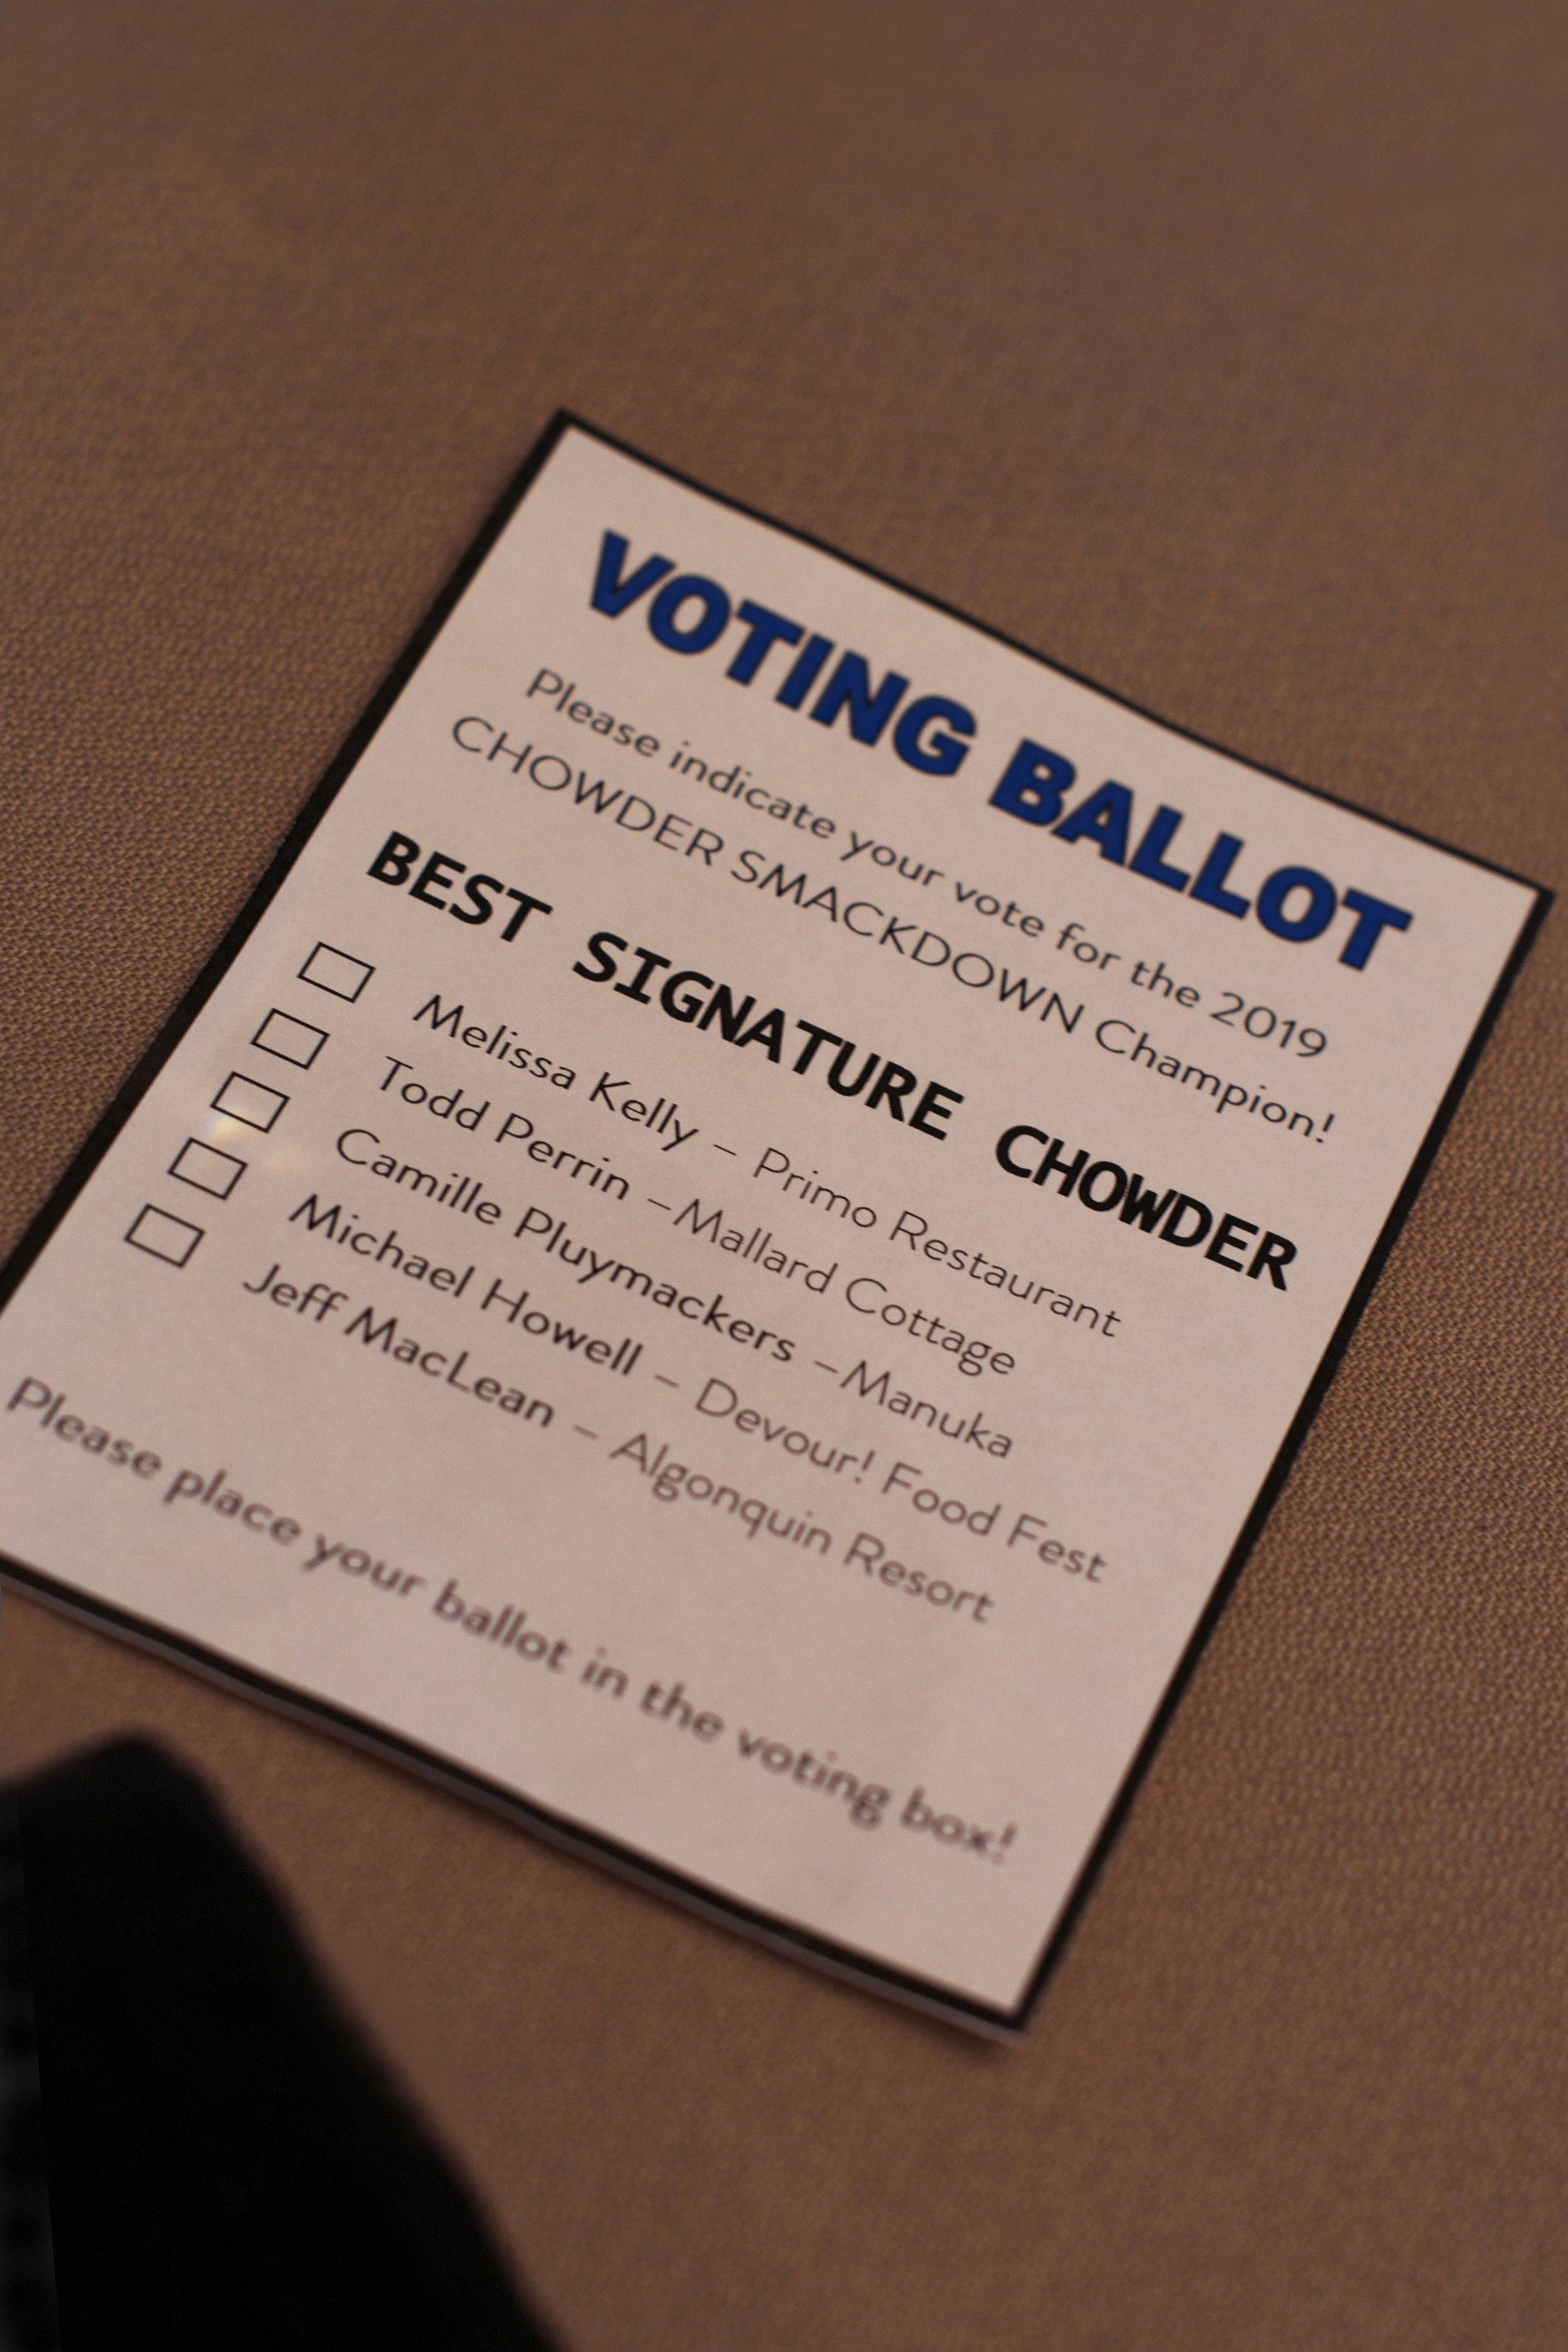 chowder-voting-ballot.jpg